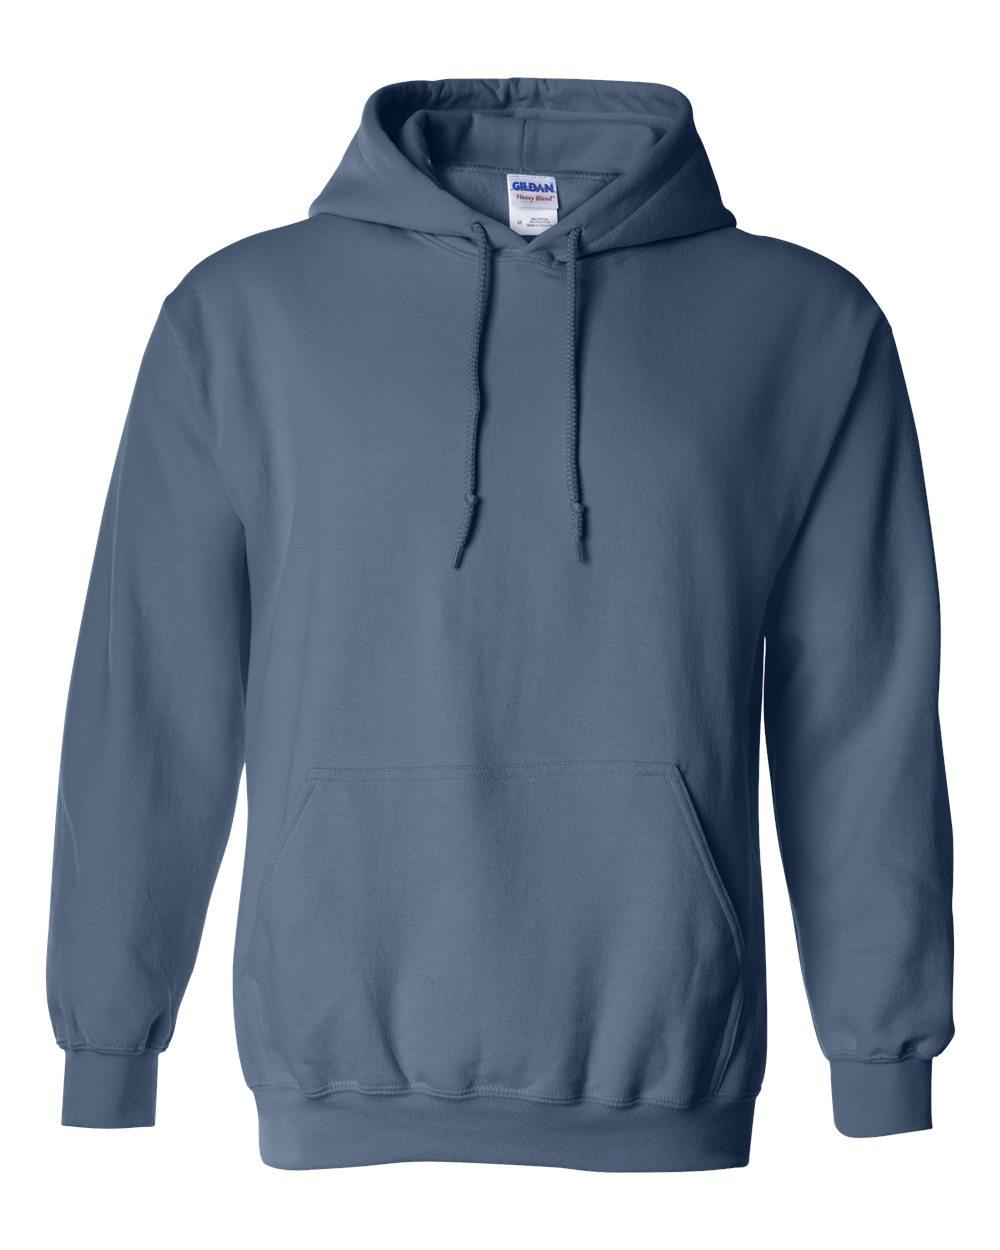 Gildan-Mens-Blank-Hoodie-Heavy-Blend-Hooded-Sweatshirt-Solid-18500-up-to-5XL thumbnail 39